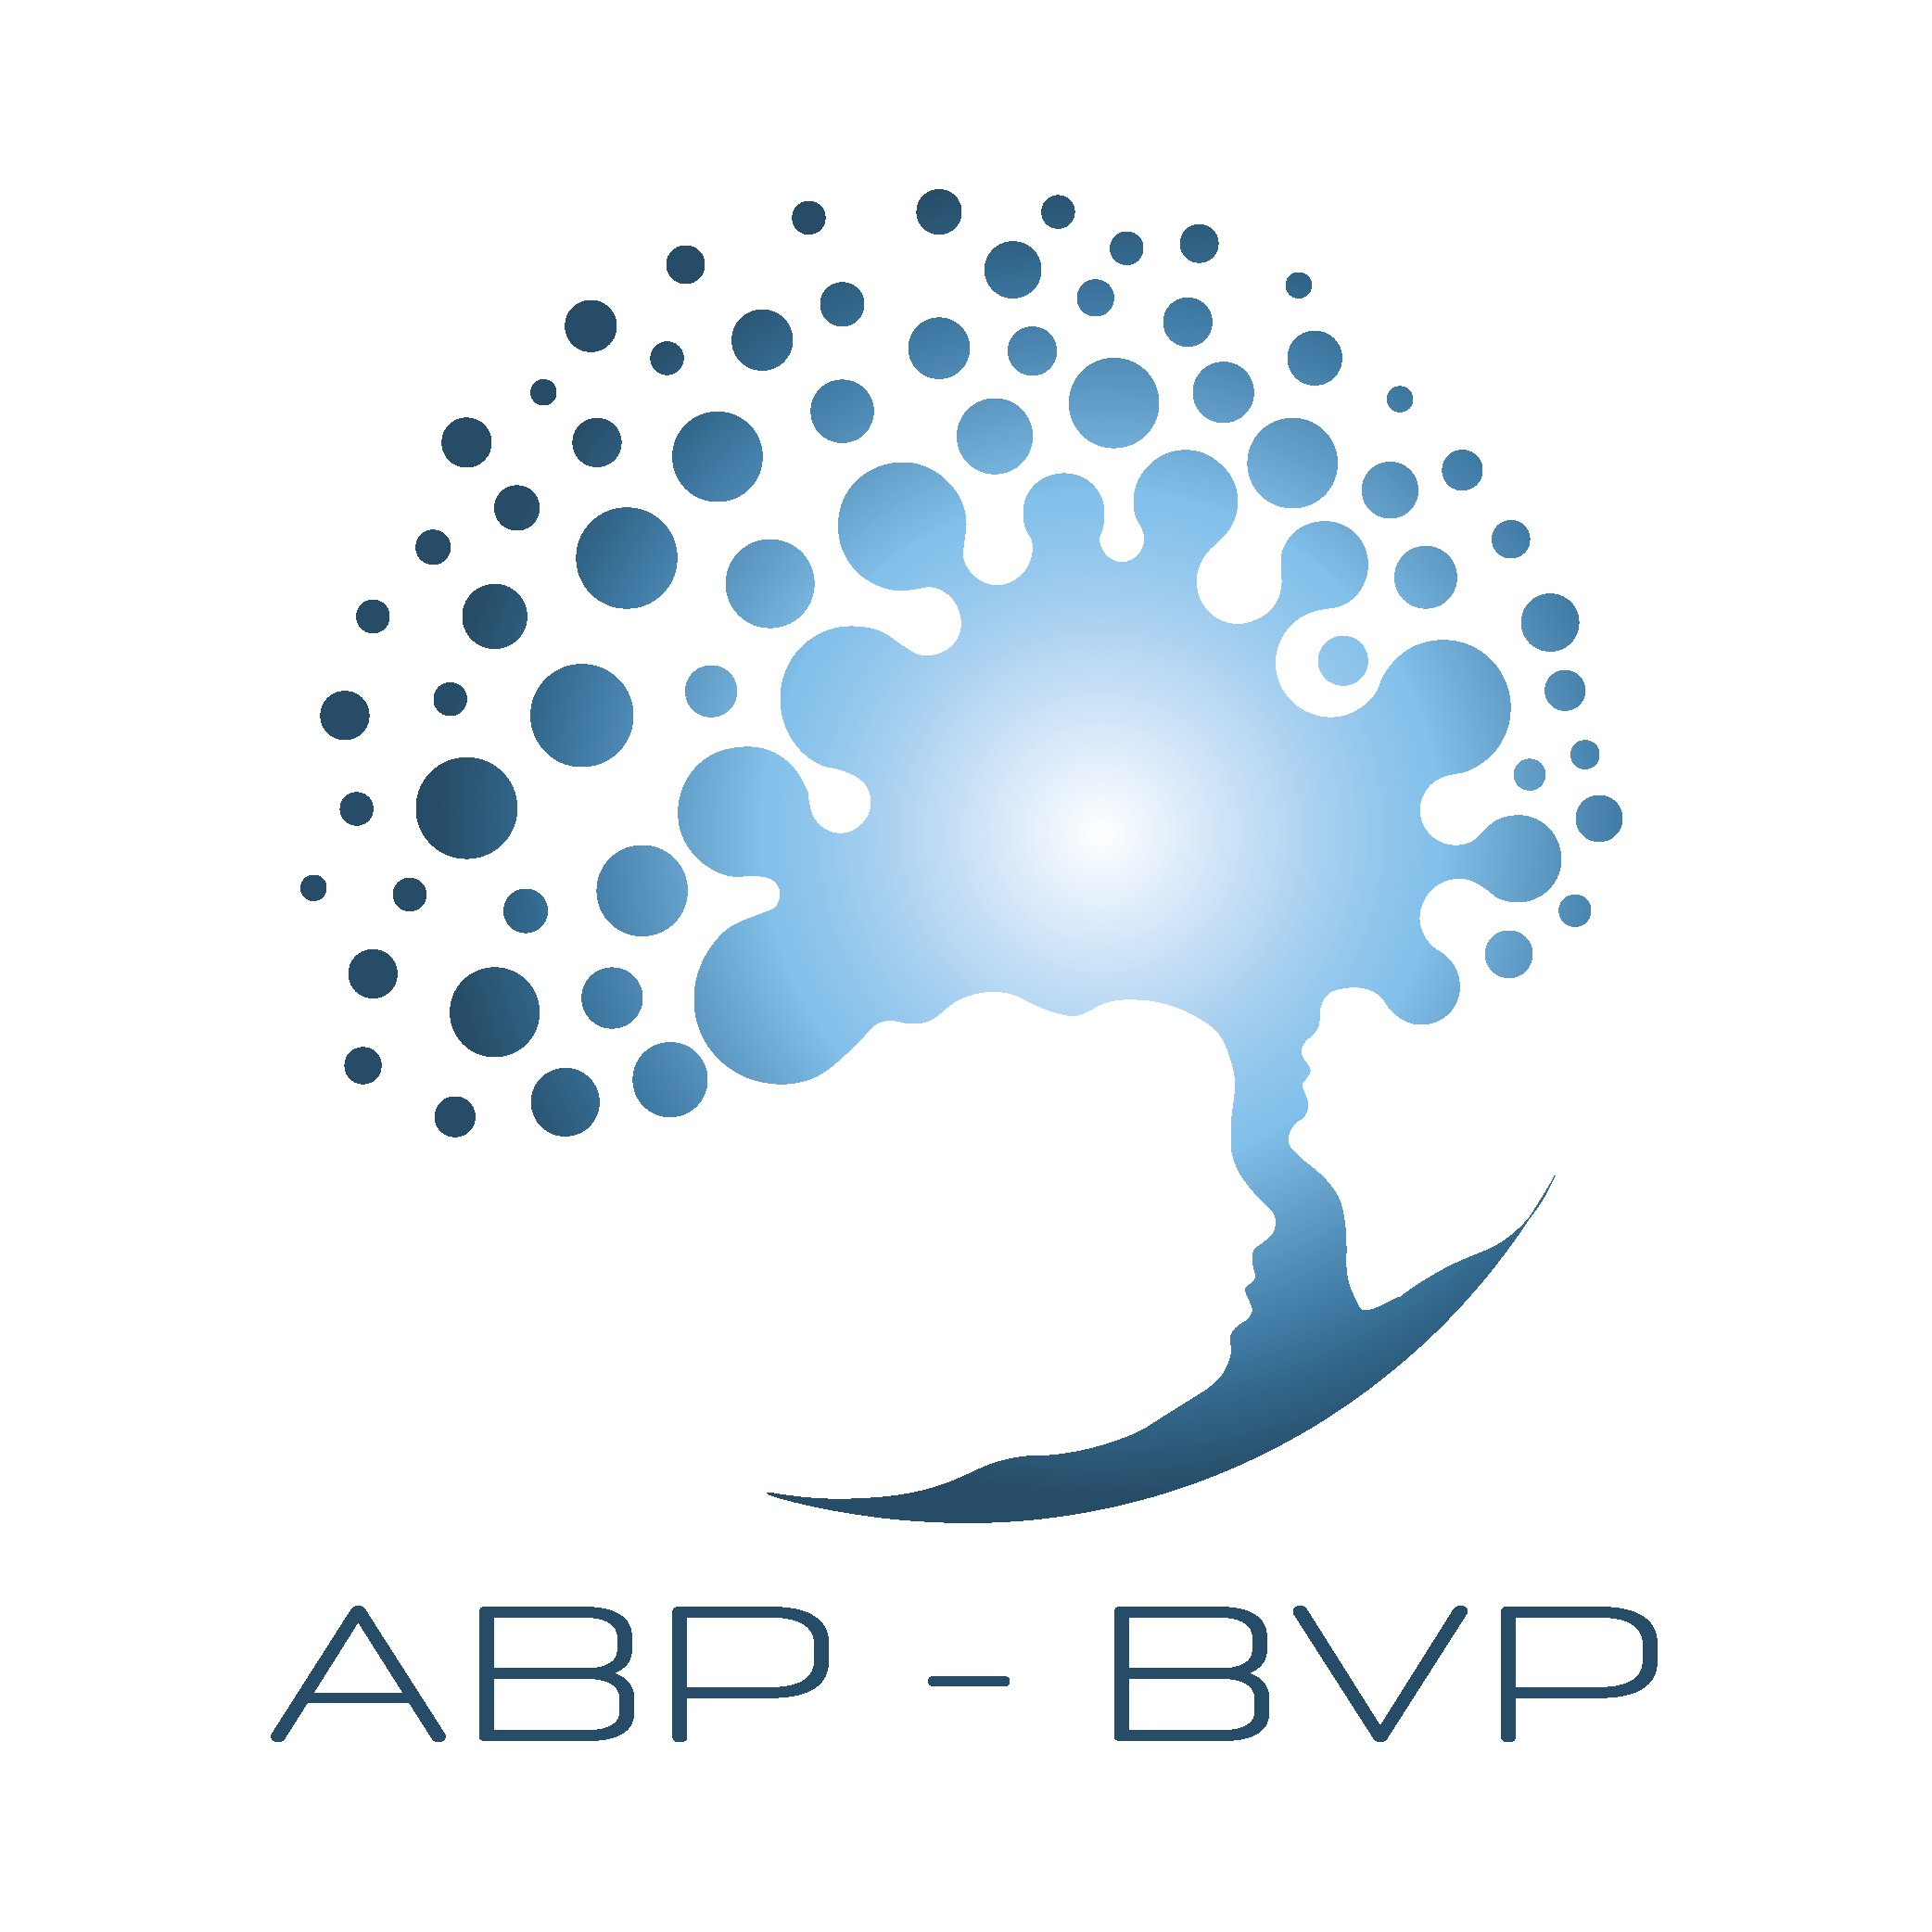 ABP-BVP